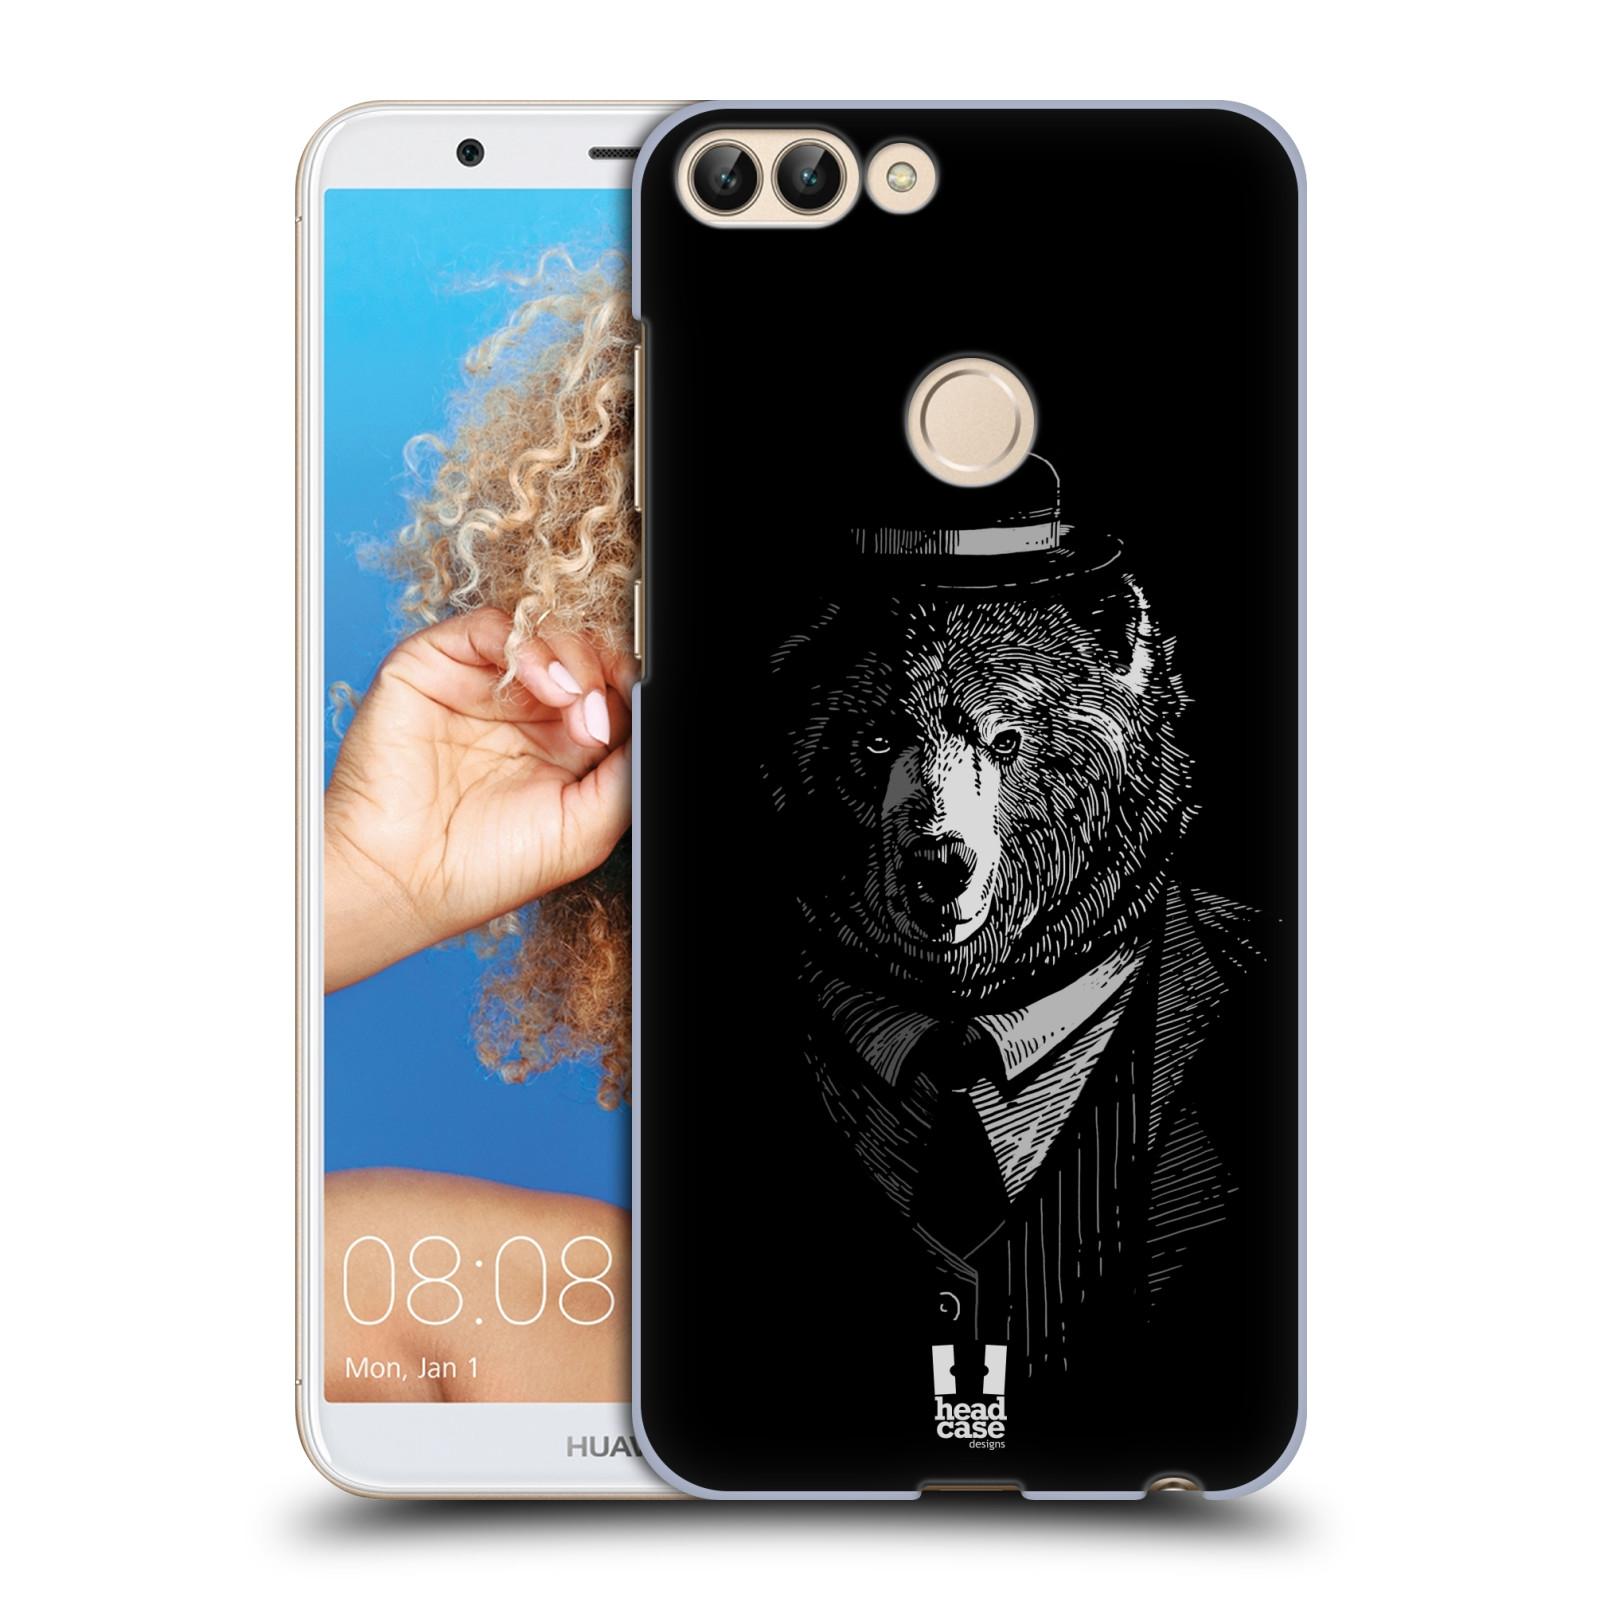 HEAD CASE plastový obal na mobil Huawei P Smart vzor Zvíře v obleku medvěd